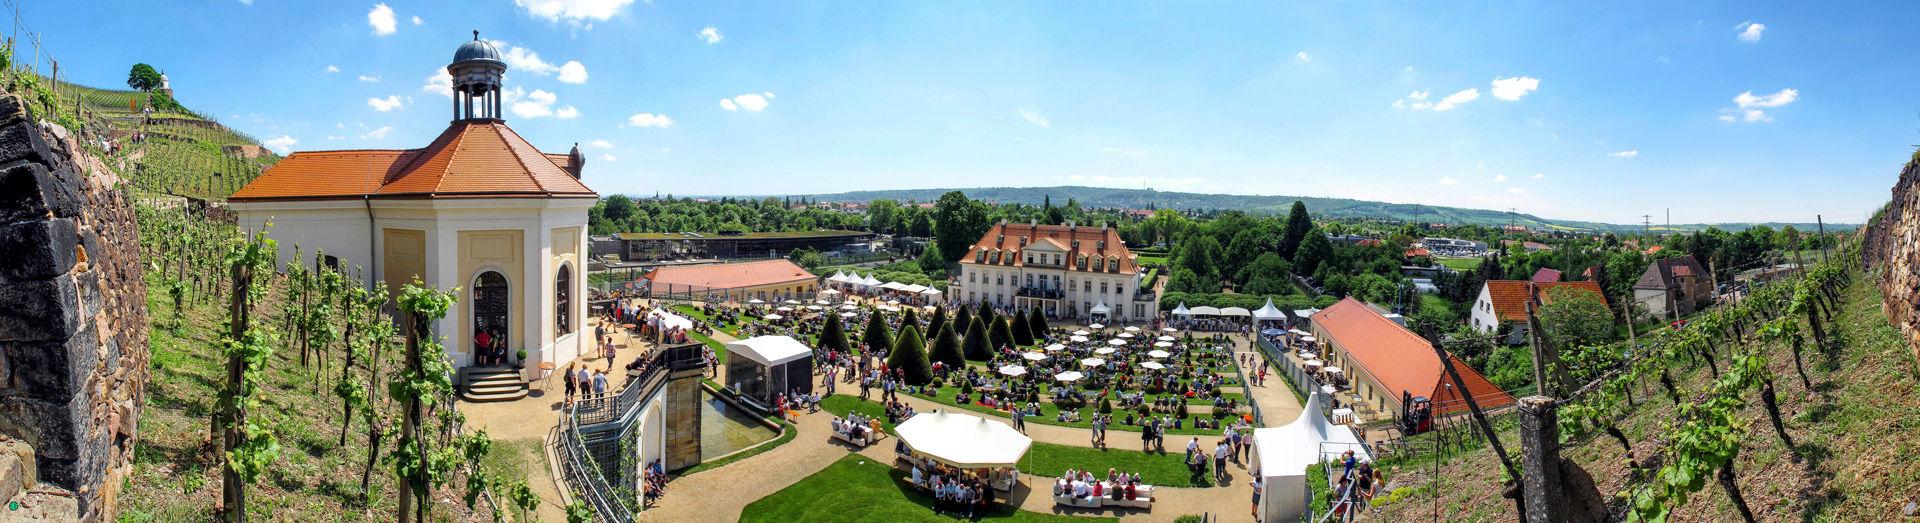 Schloss Wackerbarth_Panorama  © Heinz-Dieter Schulz